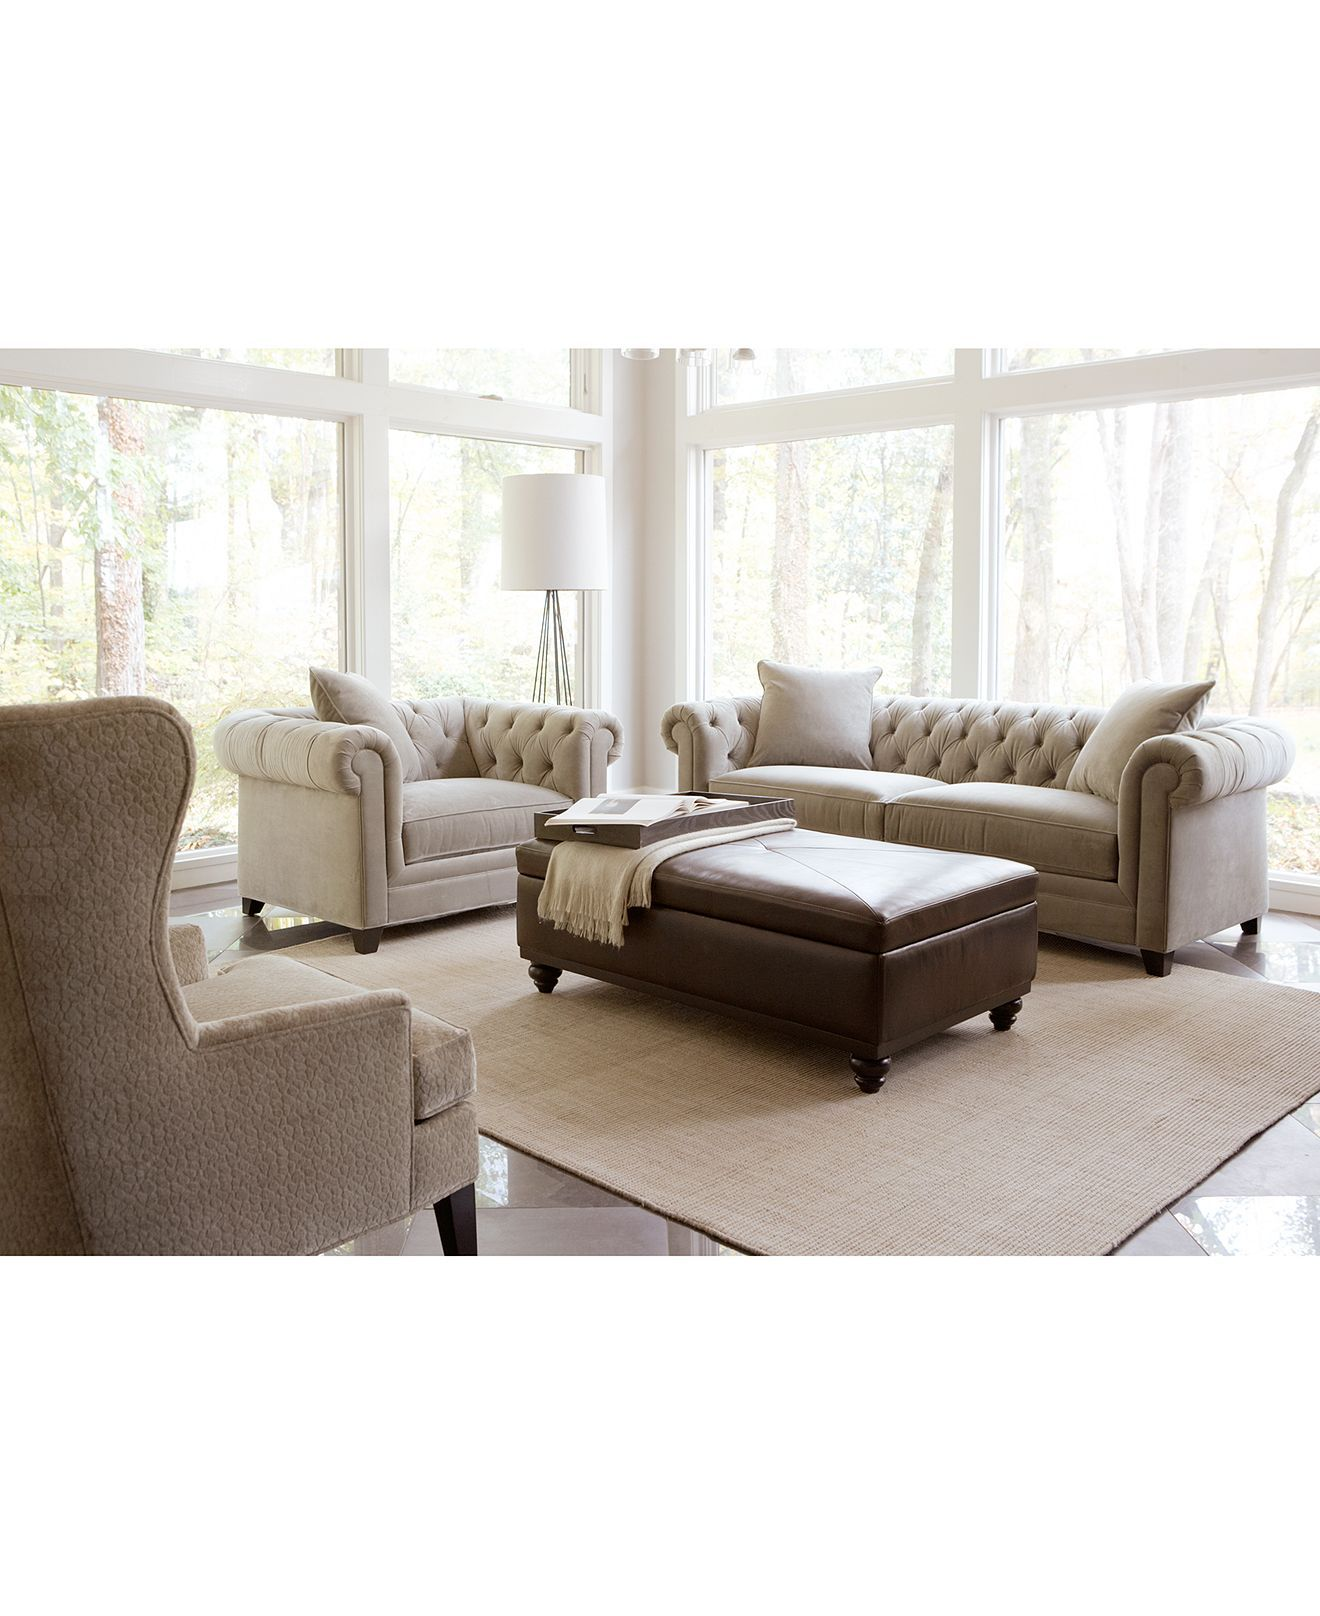 martha stewart saybridge sofa klik klak bed canada bruin blog